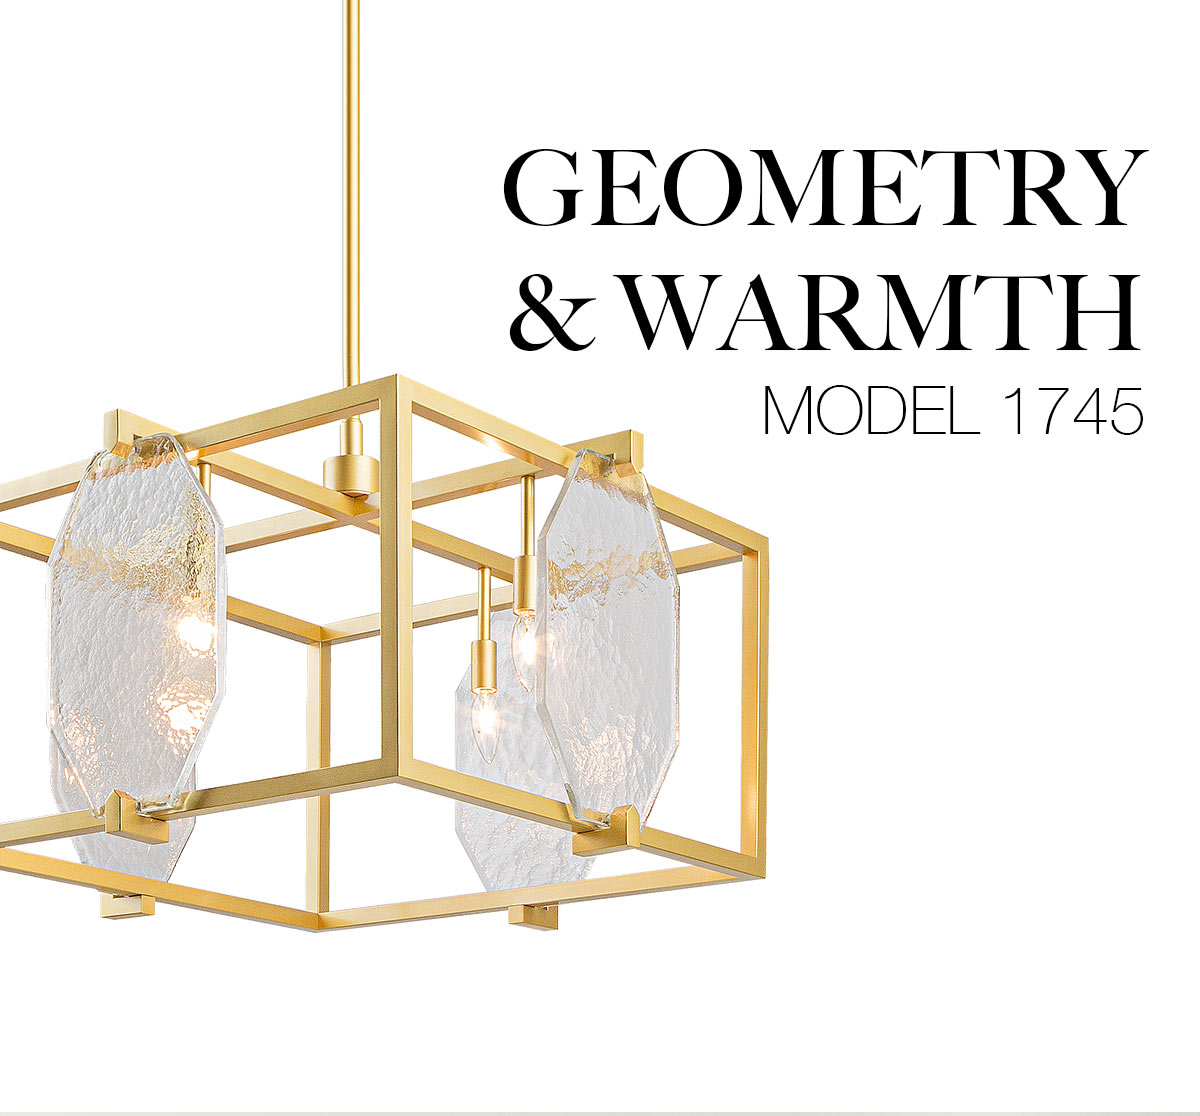 Geometry & Warmth